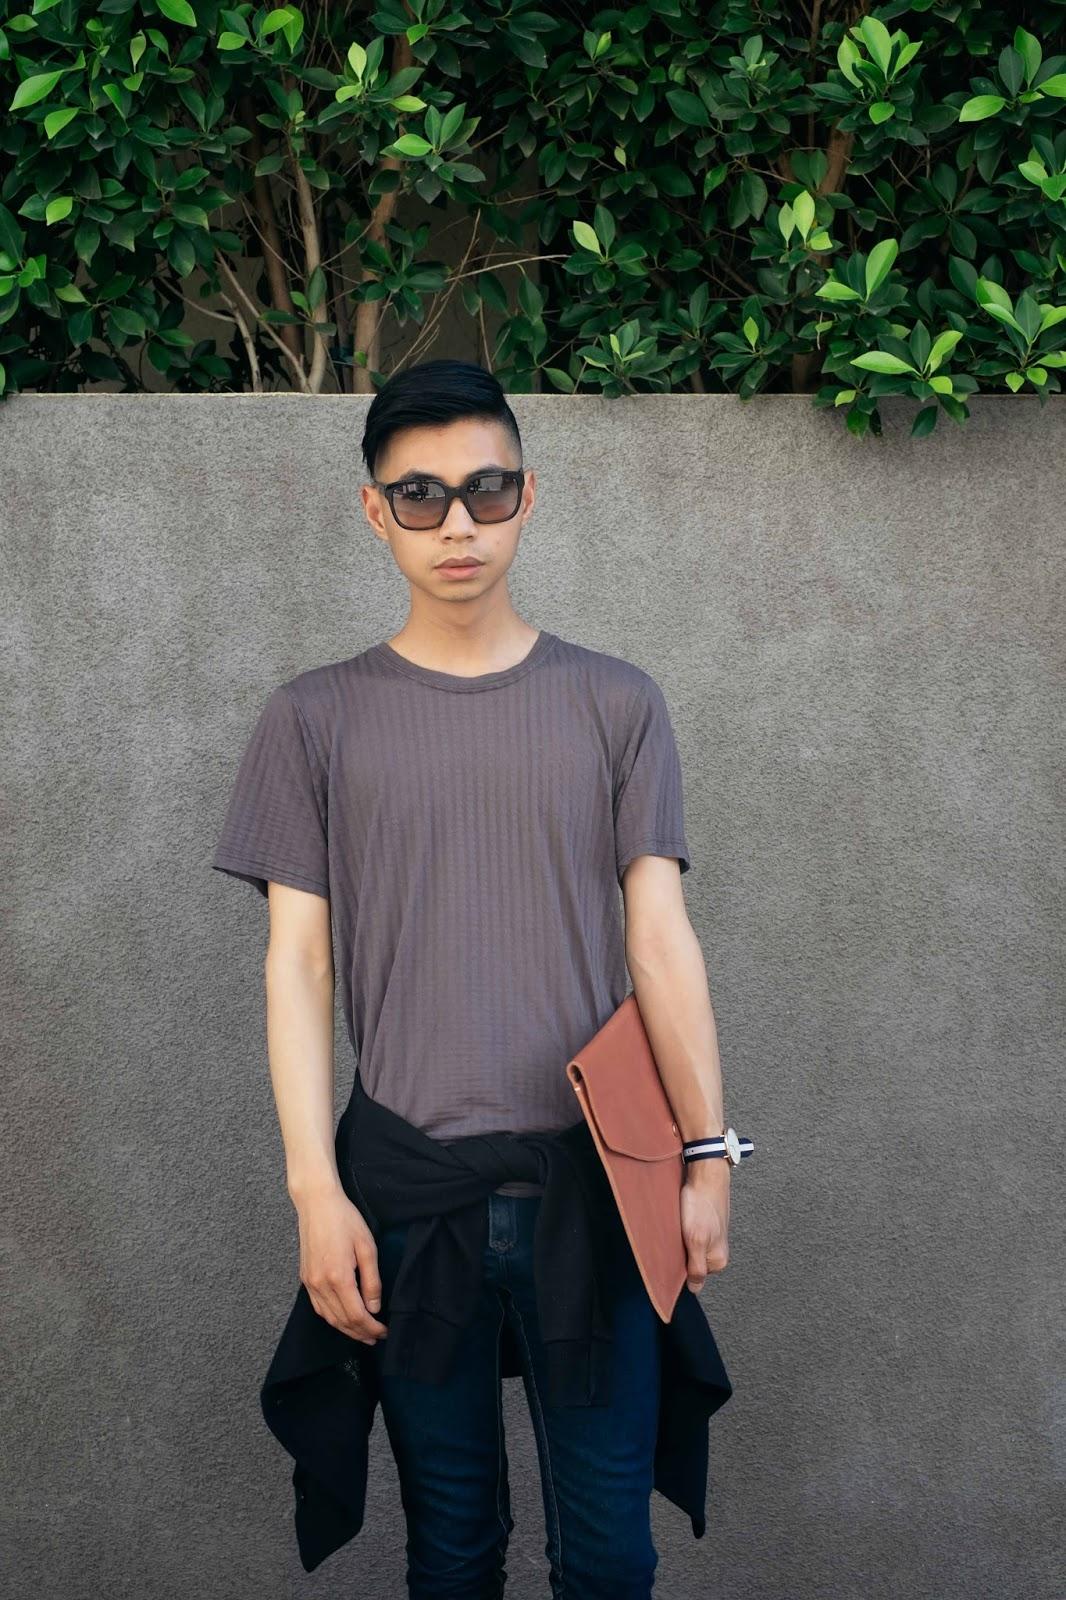 mybelonging-tommylei-menswear-blogger-shinola-warbyparker-dswshoes-11.jpg